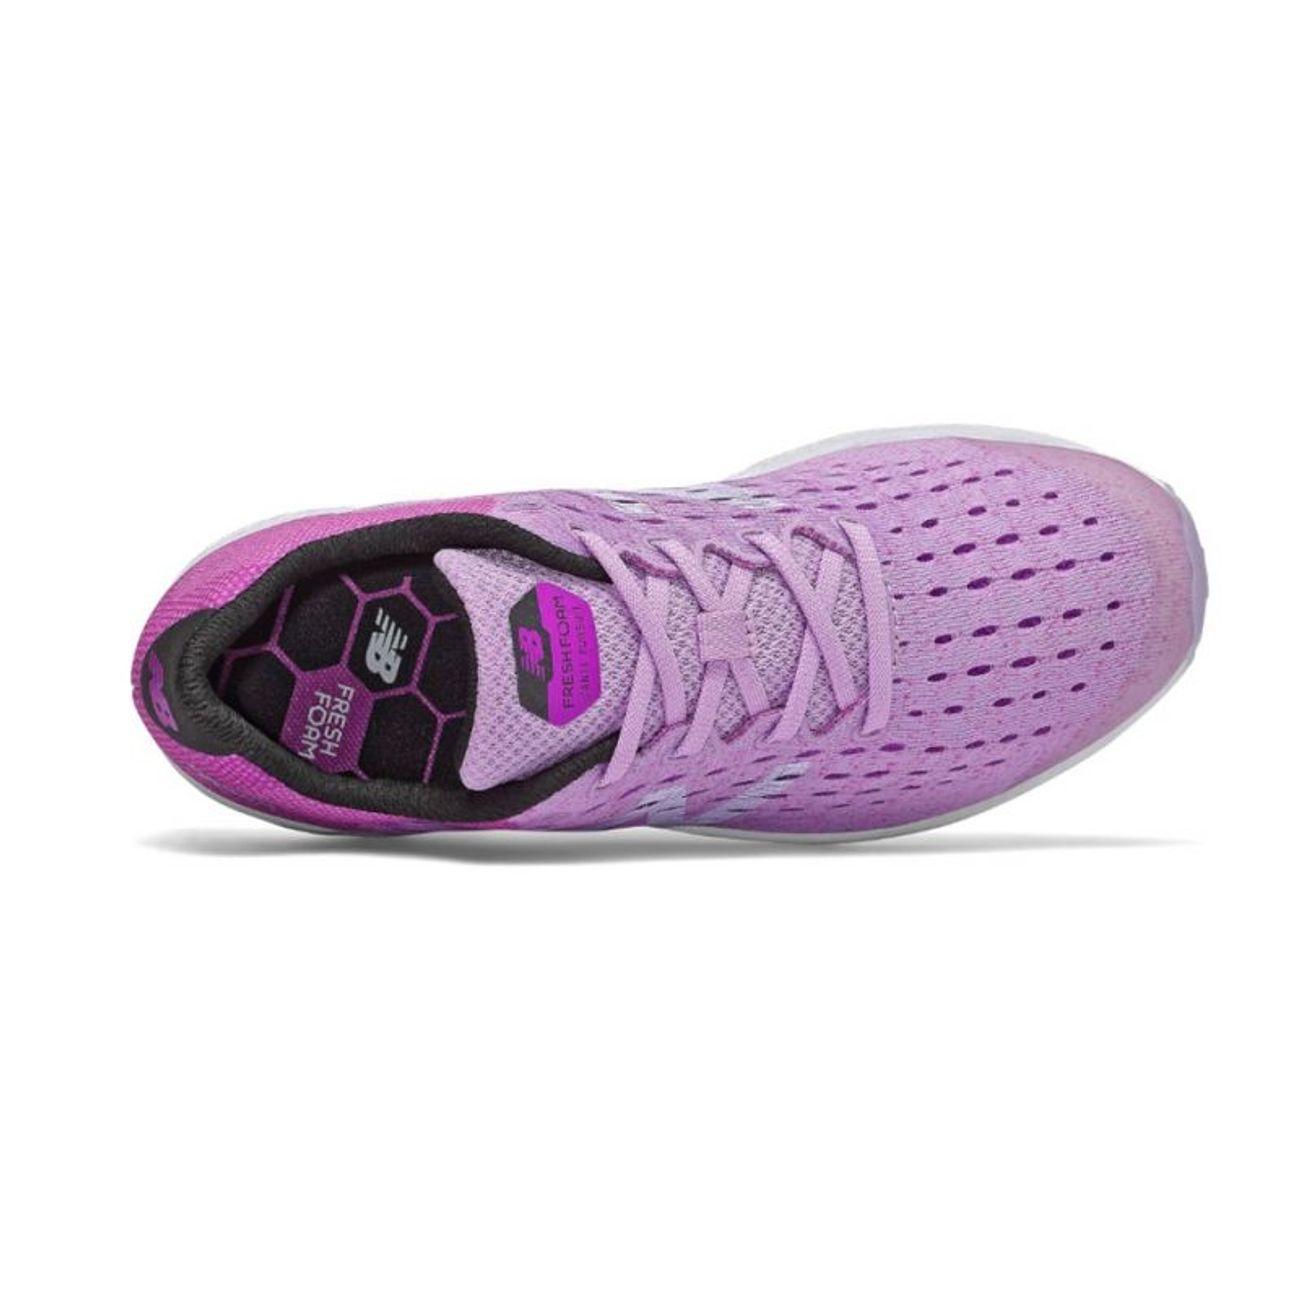 Fille Pursuit Balance Fresh Zante Violet Adulte Padel New Foam Gpznpvv N0nw8ymOv